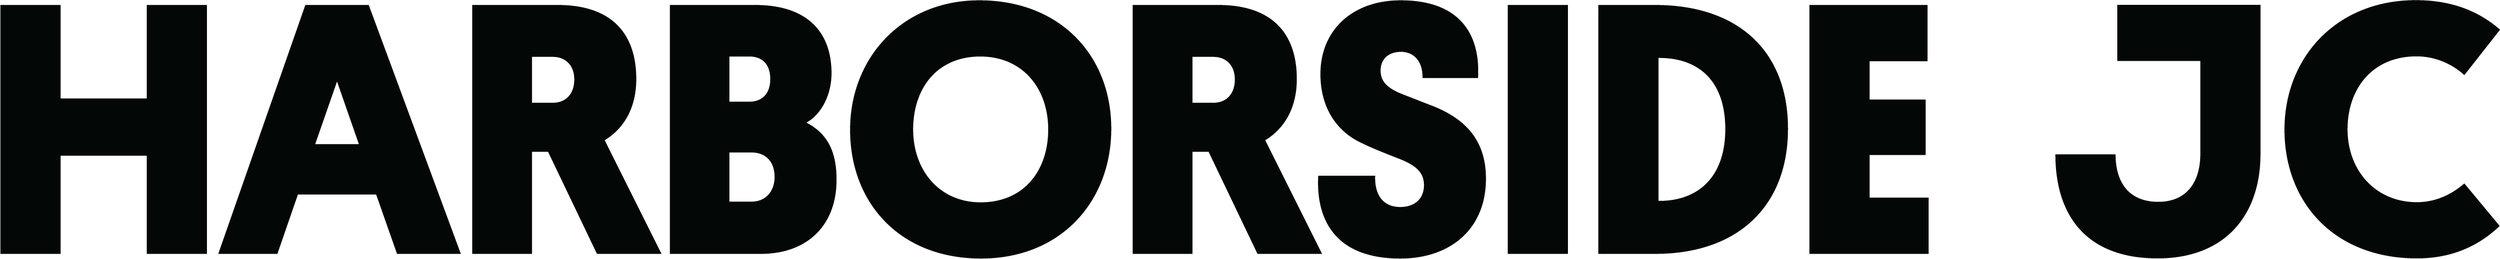 HJC_Logo_HOR_RGB_BLK copy.jpg